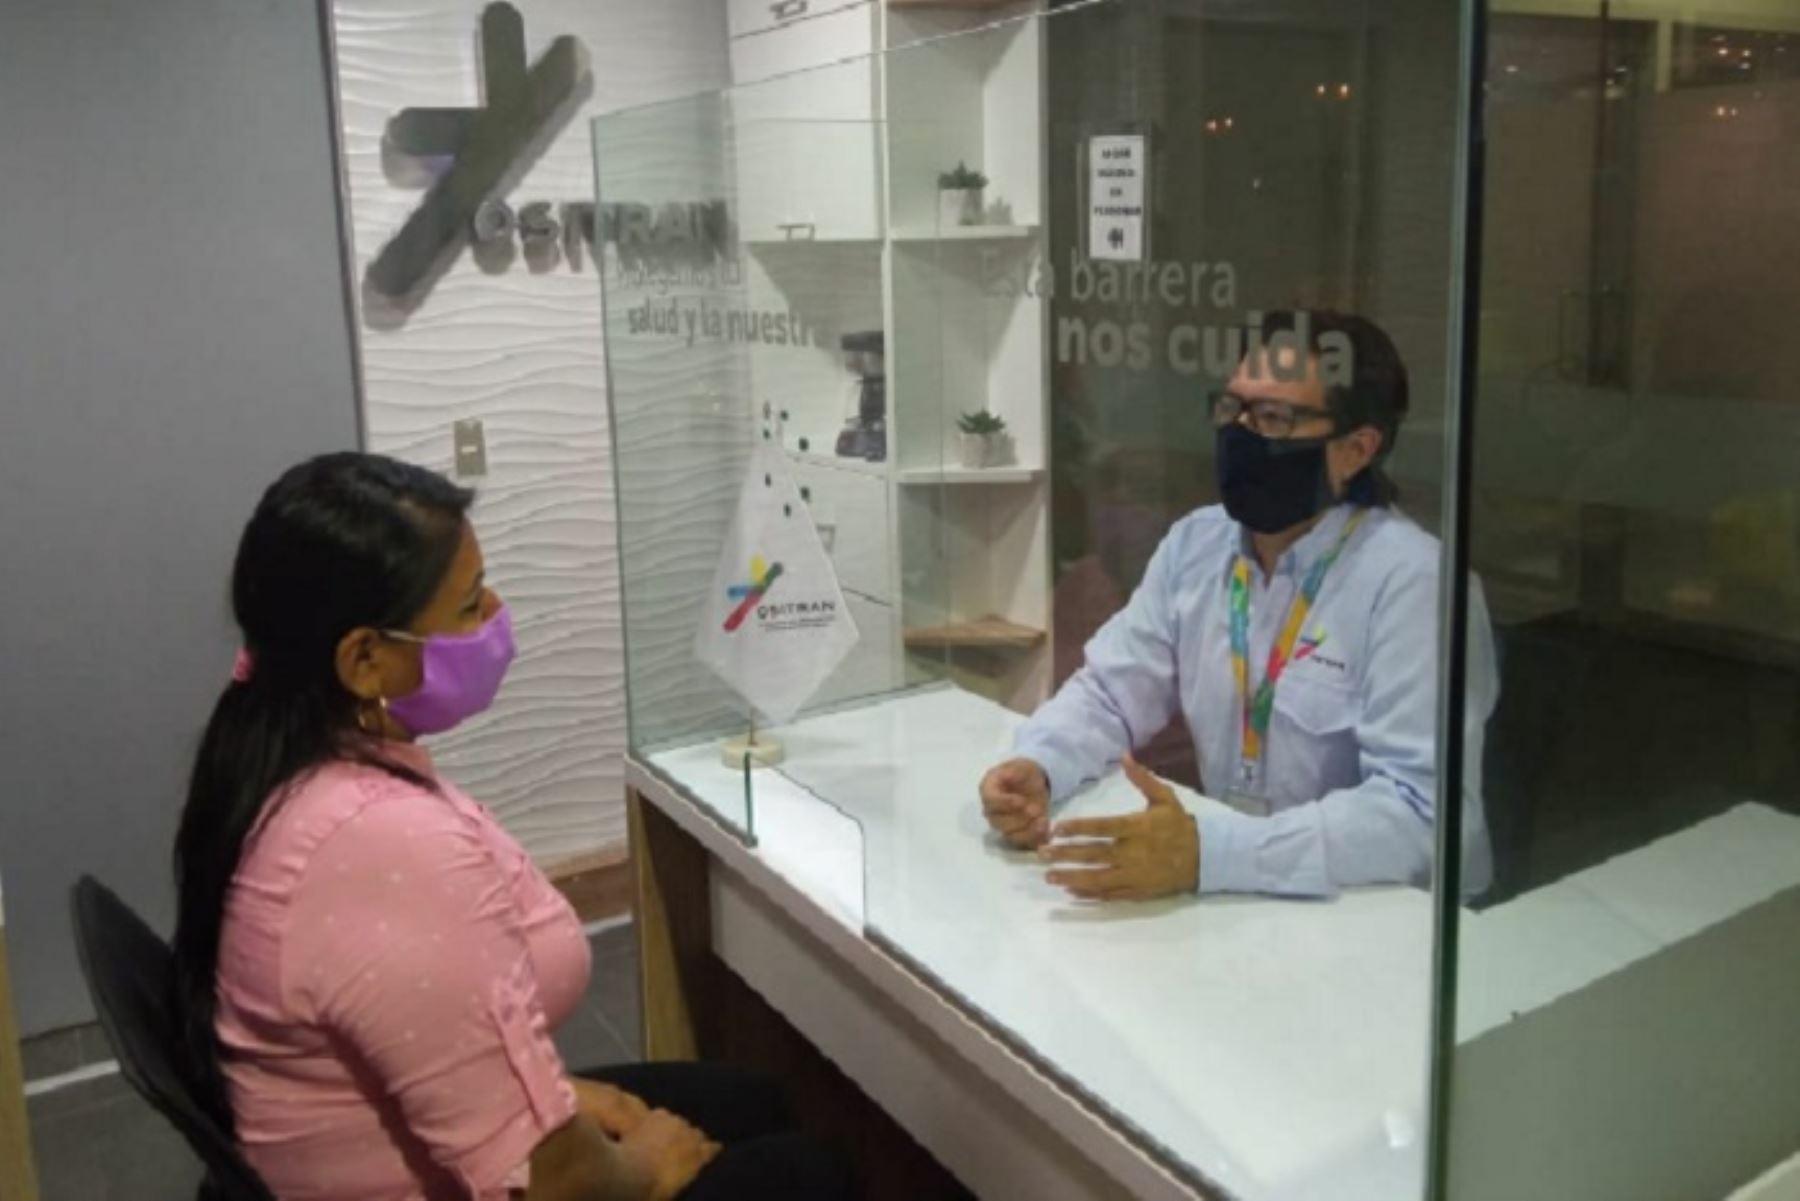 A más de 7,000 loretanos atendió Ositrán a través de oficina descentralizada